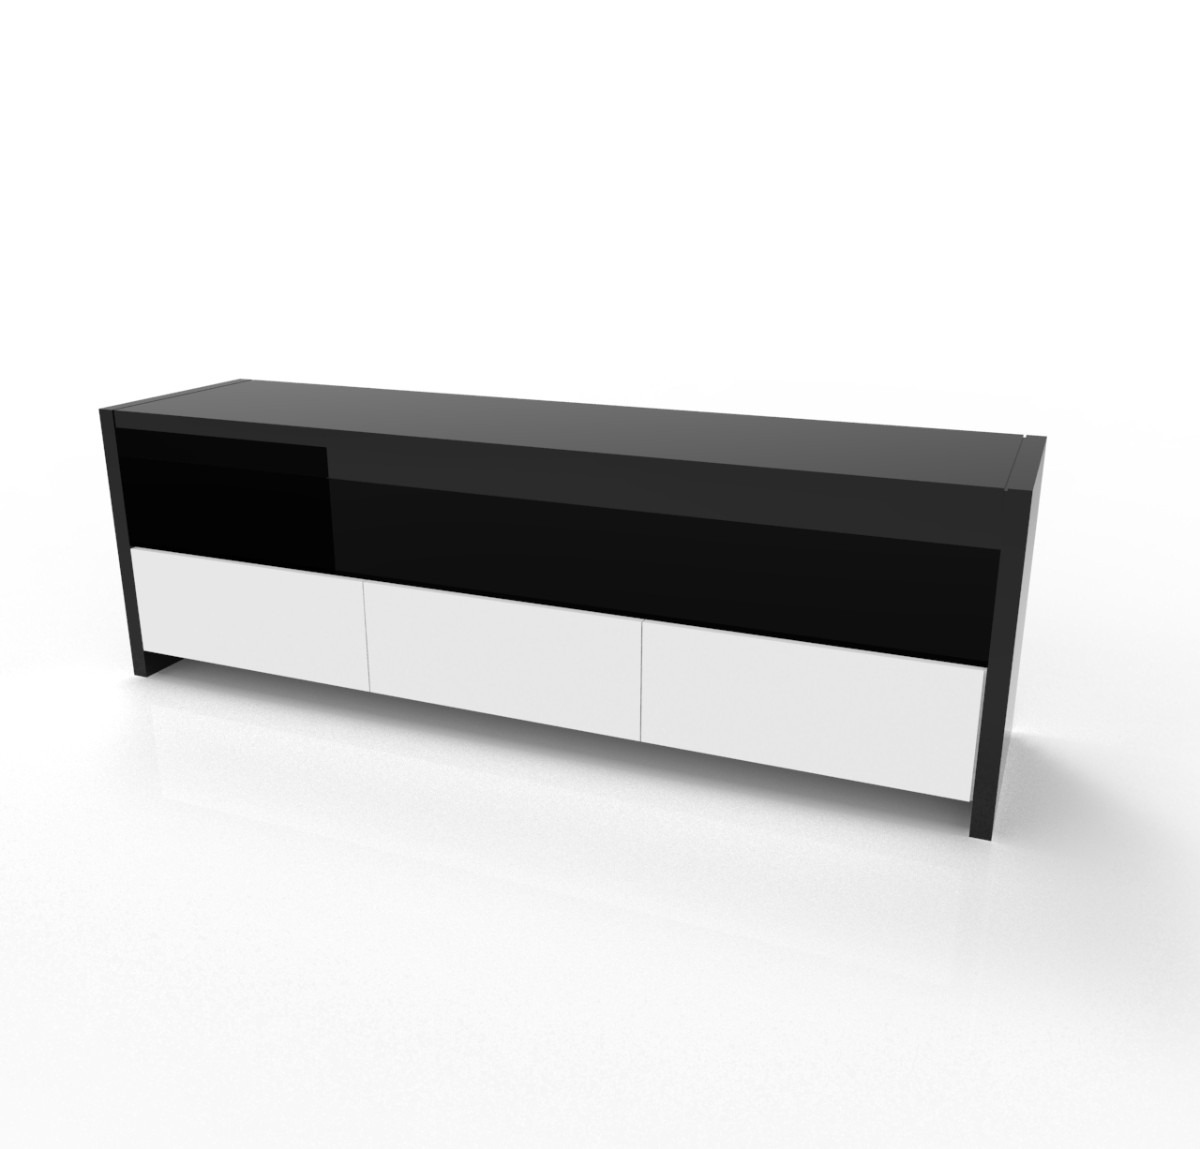 Mueble para tv dise o moderno minimalista en for Mueble minimalista